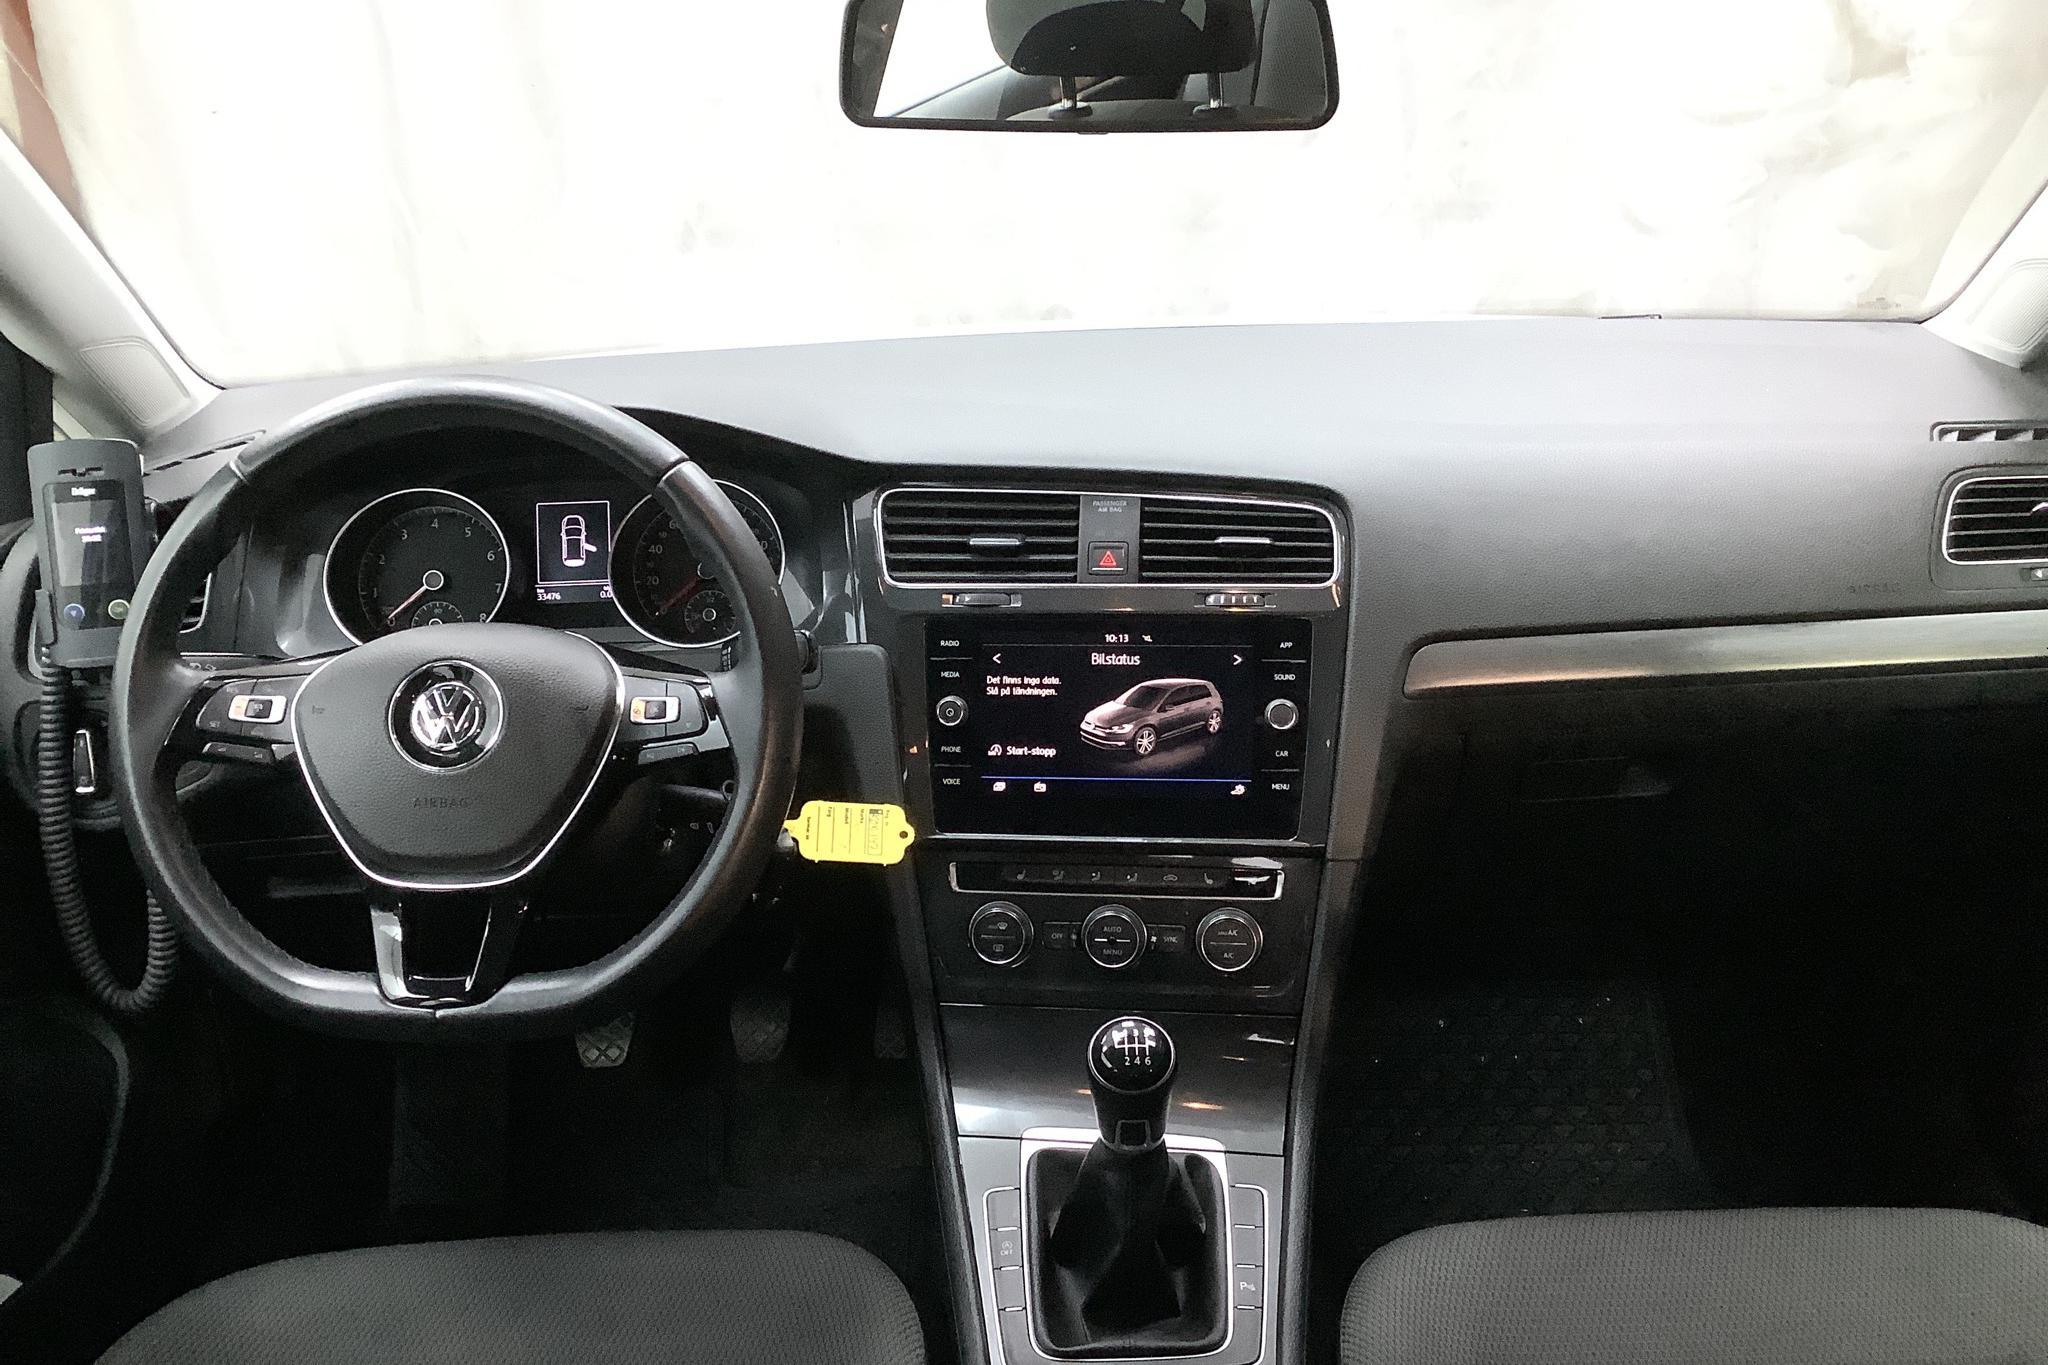 VW Golf VII 1.4 TSI Multifuel 5dr (125hk) - 3 348 mil - Manuell - vit - 2018